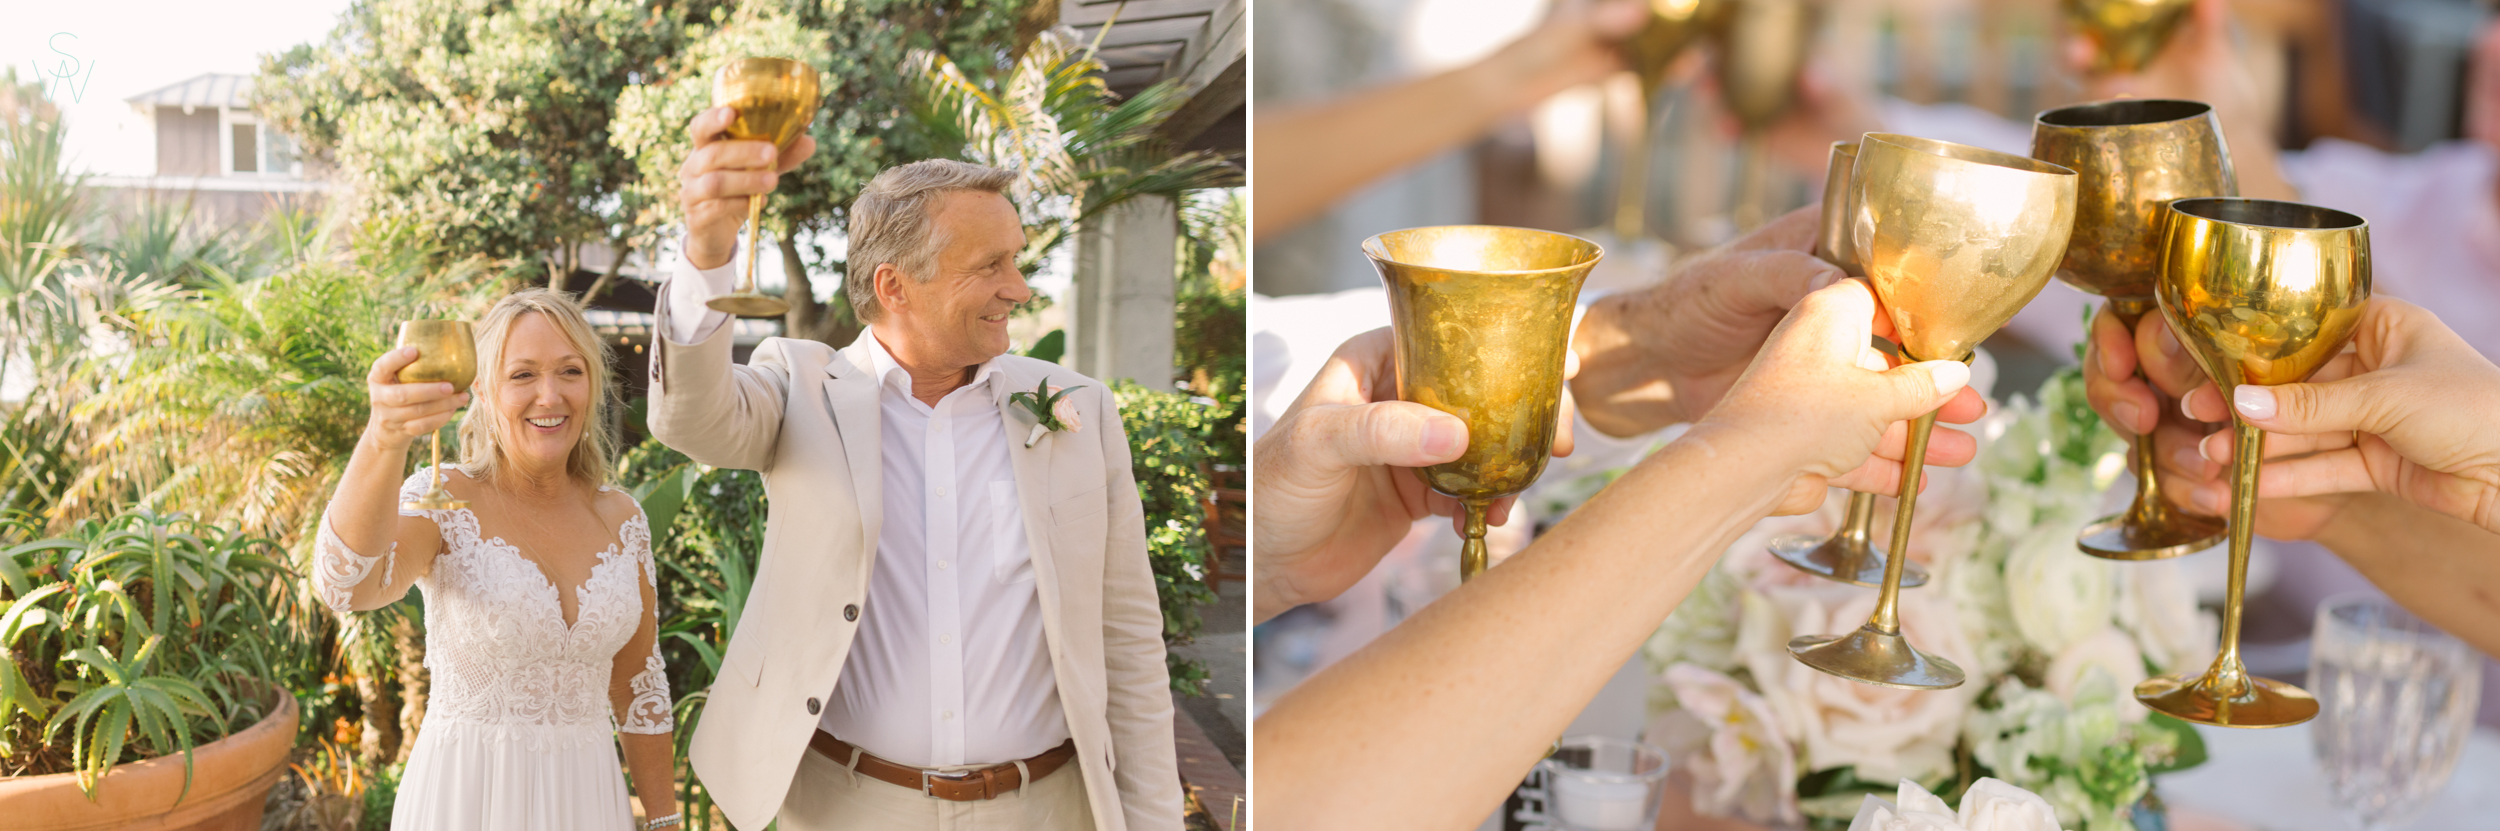 147DEL.MAR.WEDDINGS.weddingtoast.photography.shewanders.JPG